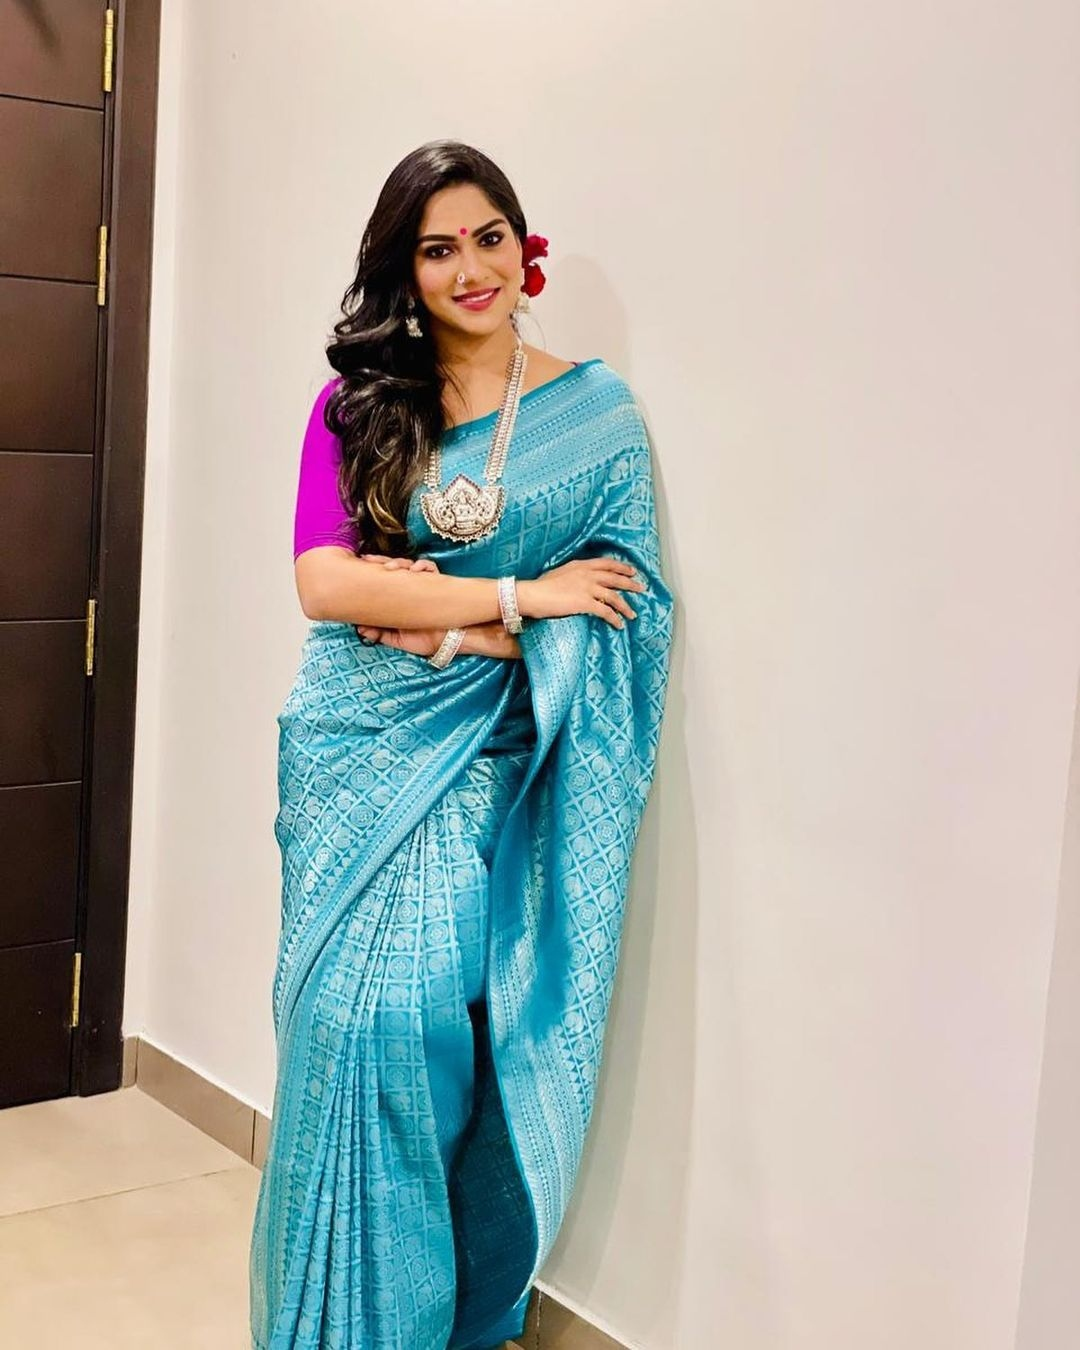 siddharth bharathan movie new